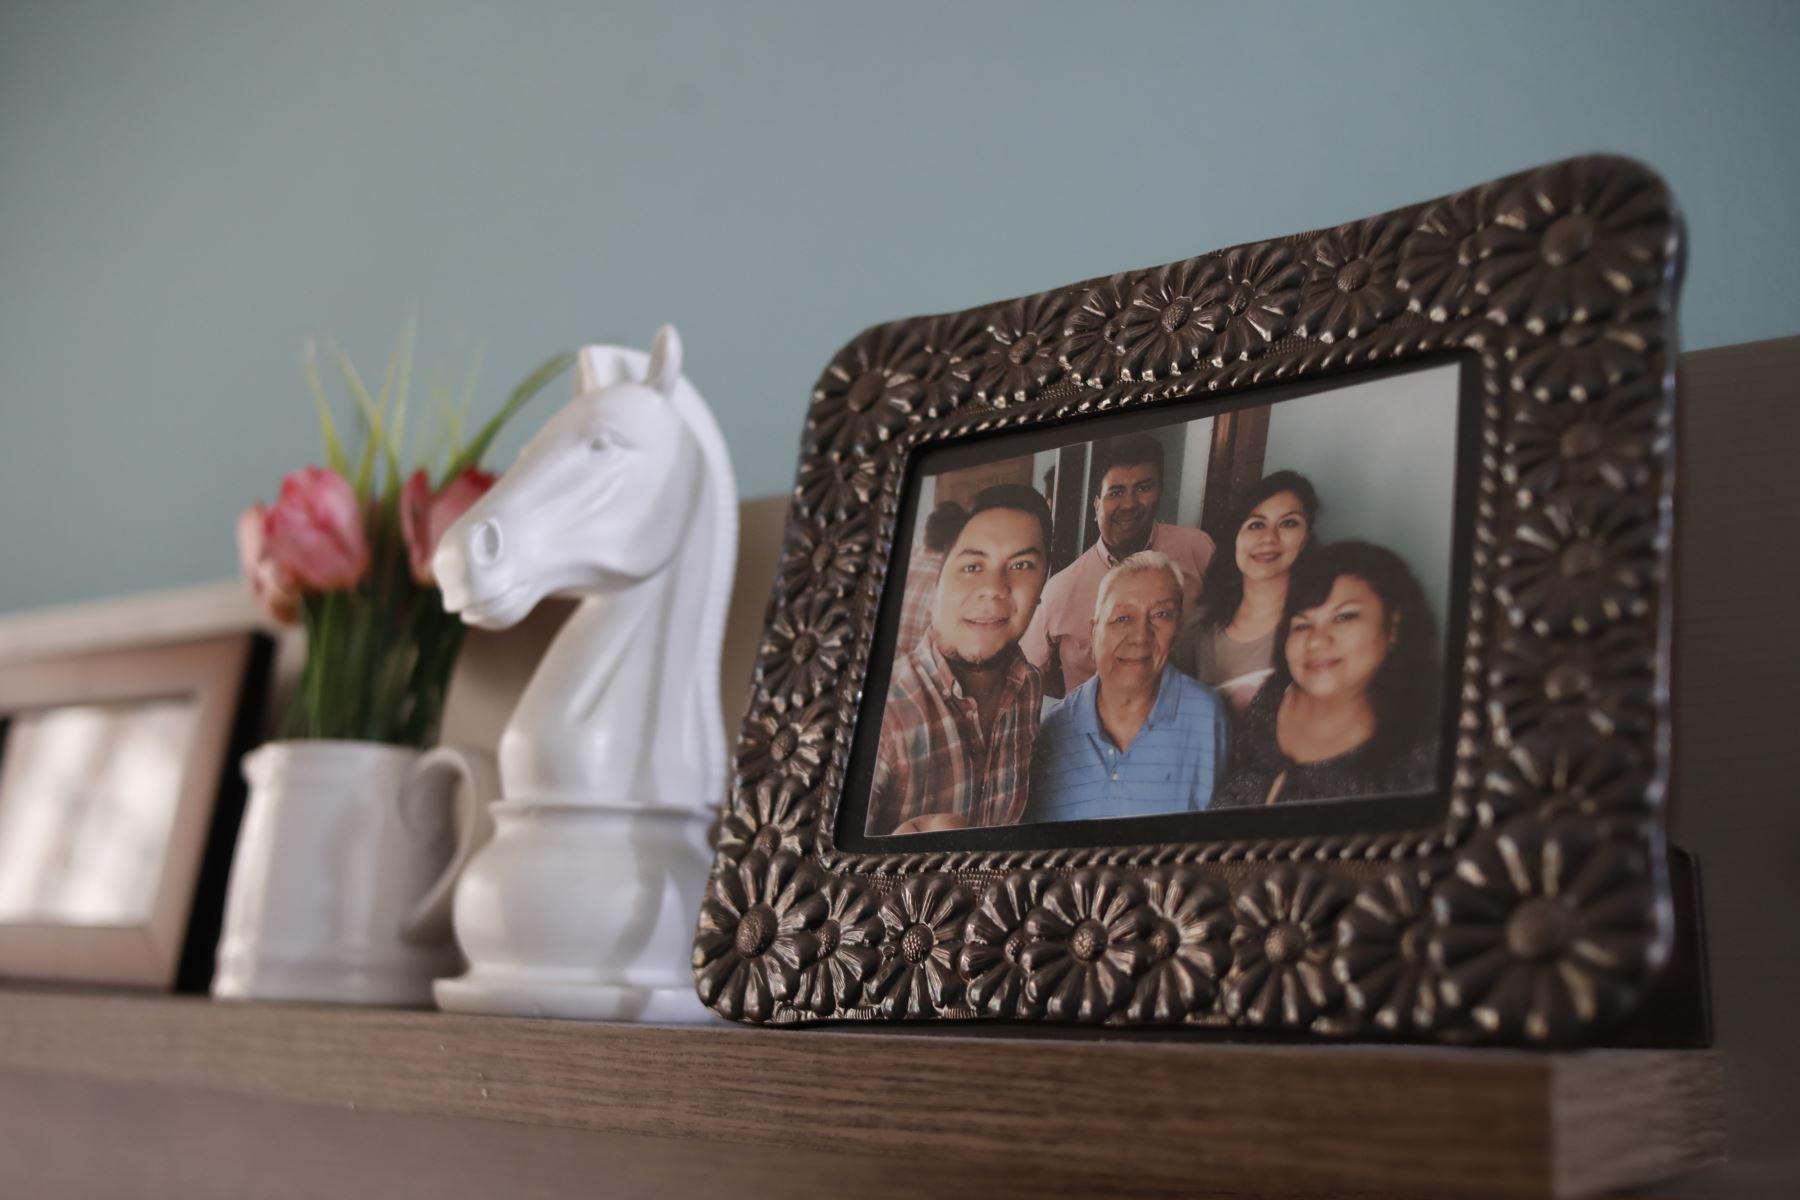 Moisés Piscoya junto a sus seres queridos en un retrato familiar. Foto: ANDINA/Presidencia/Renato Pajuelo